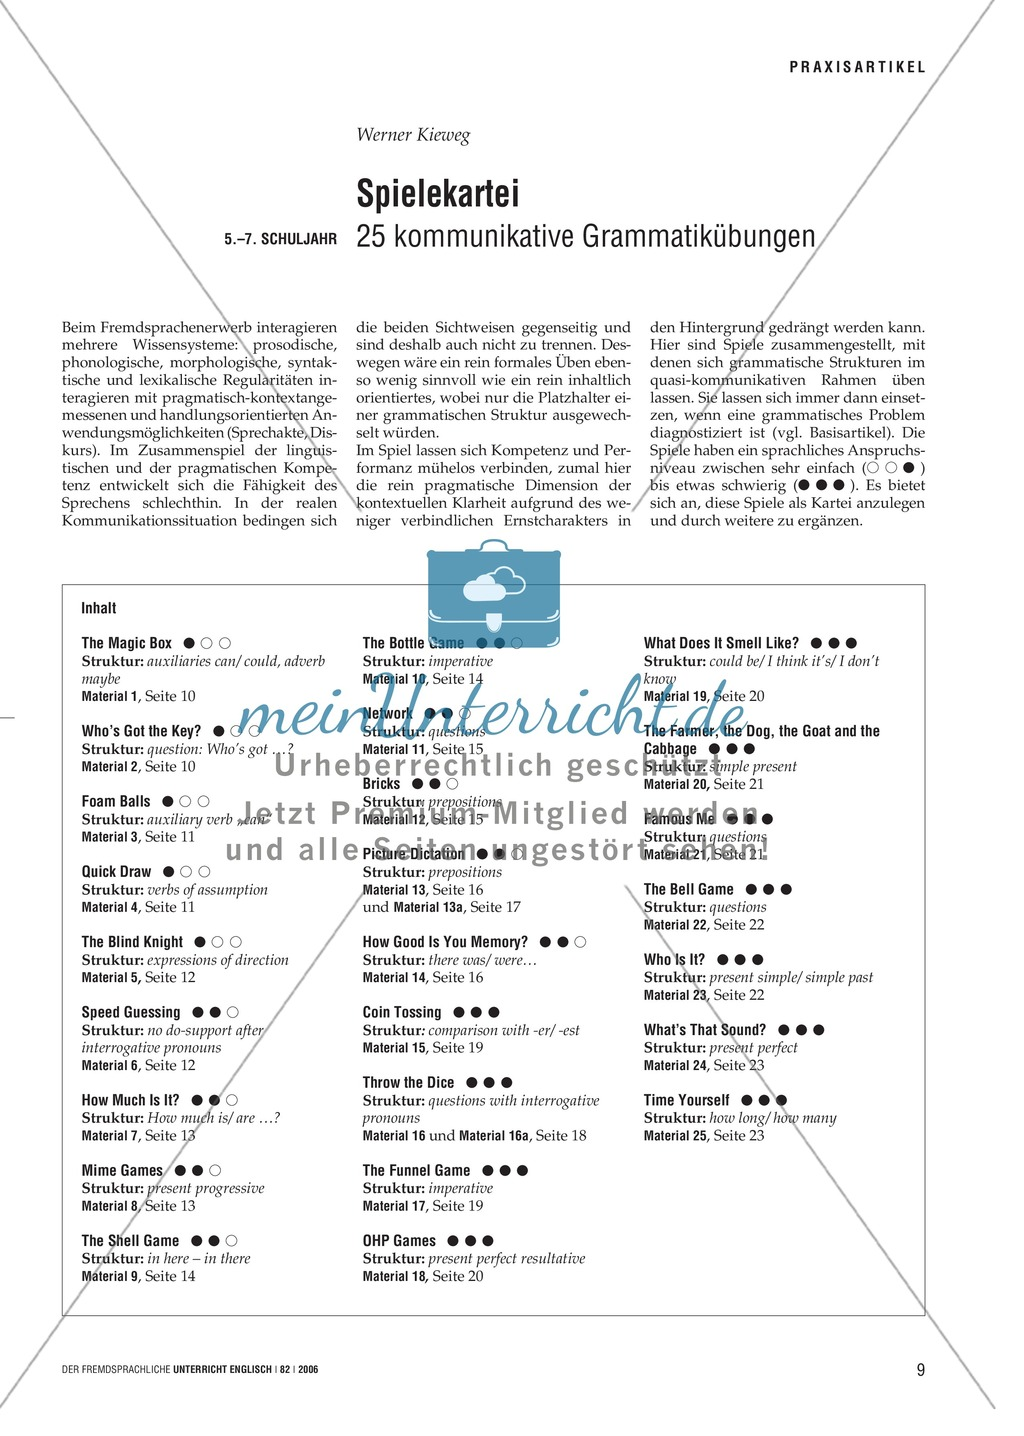 Spielekartei. 25 kommunikative Grammatikübungen: Praxisartikel Preview 0